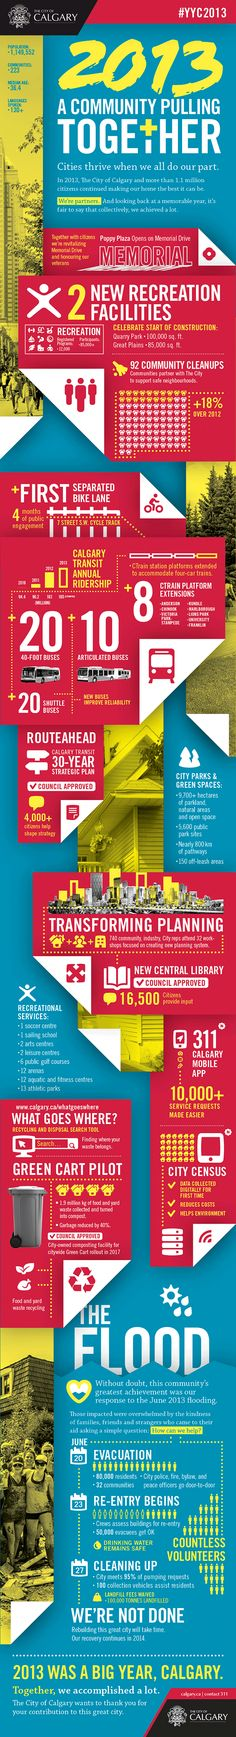 Calgary City News Blog: City Infographic captures highlights of 2013